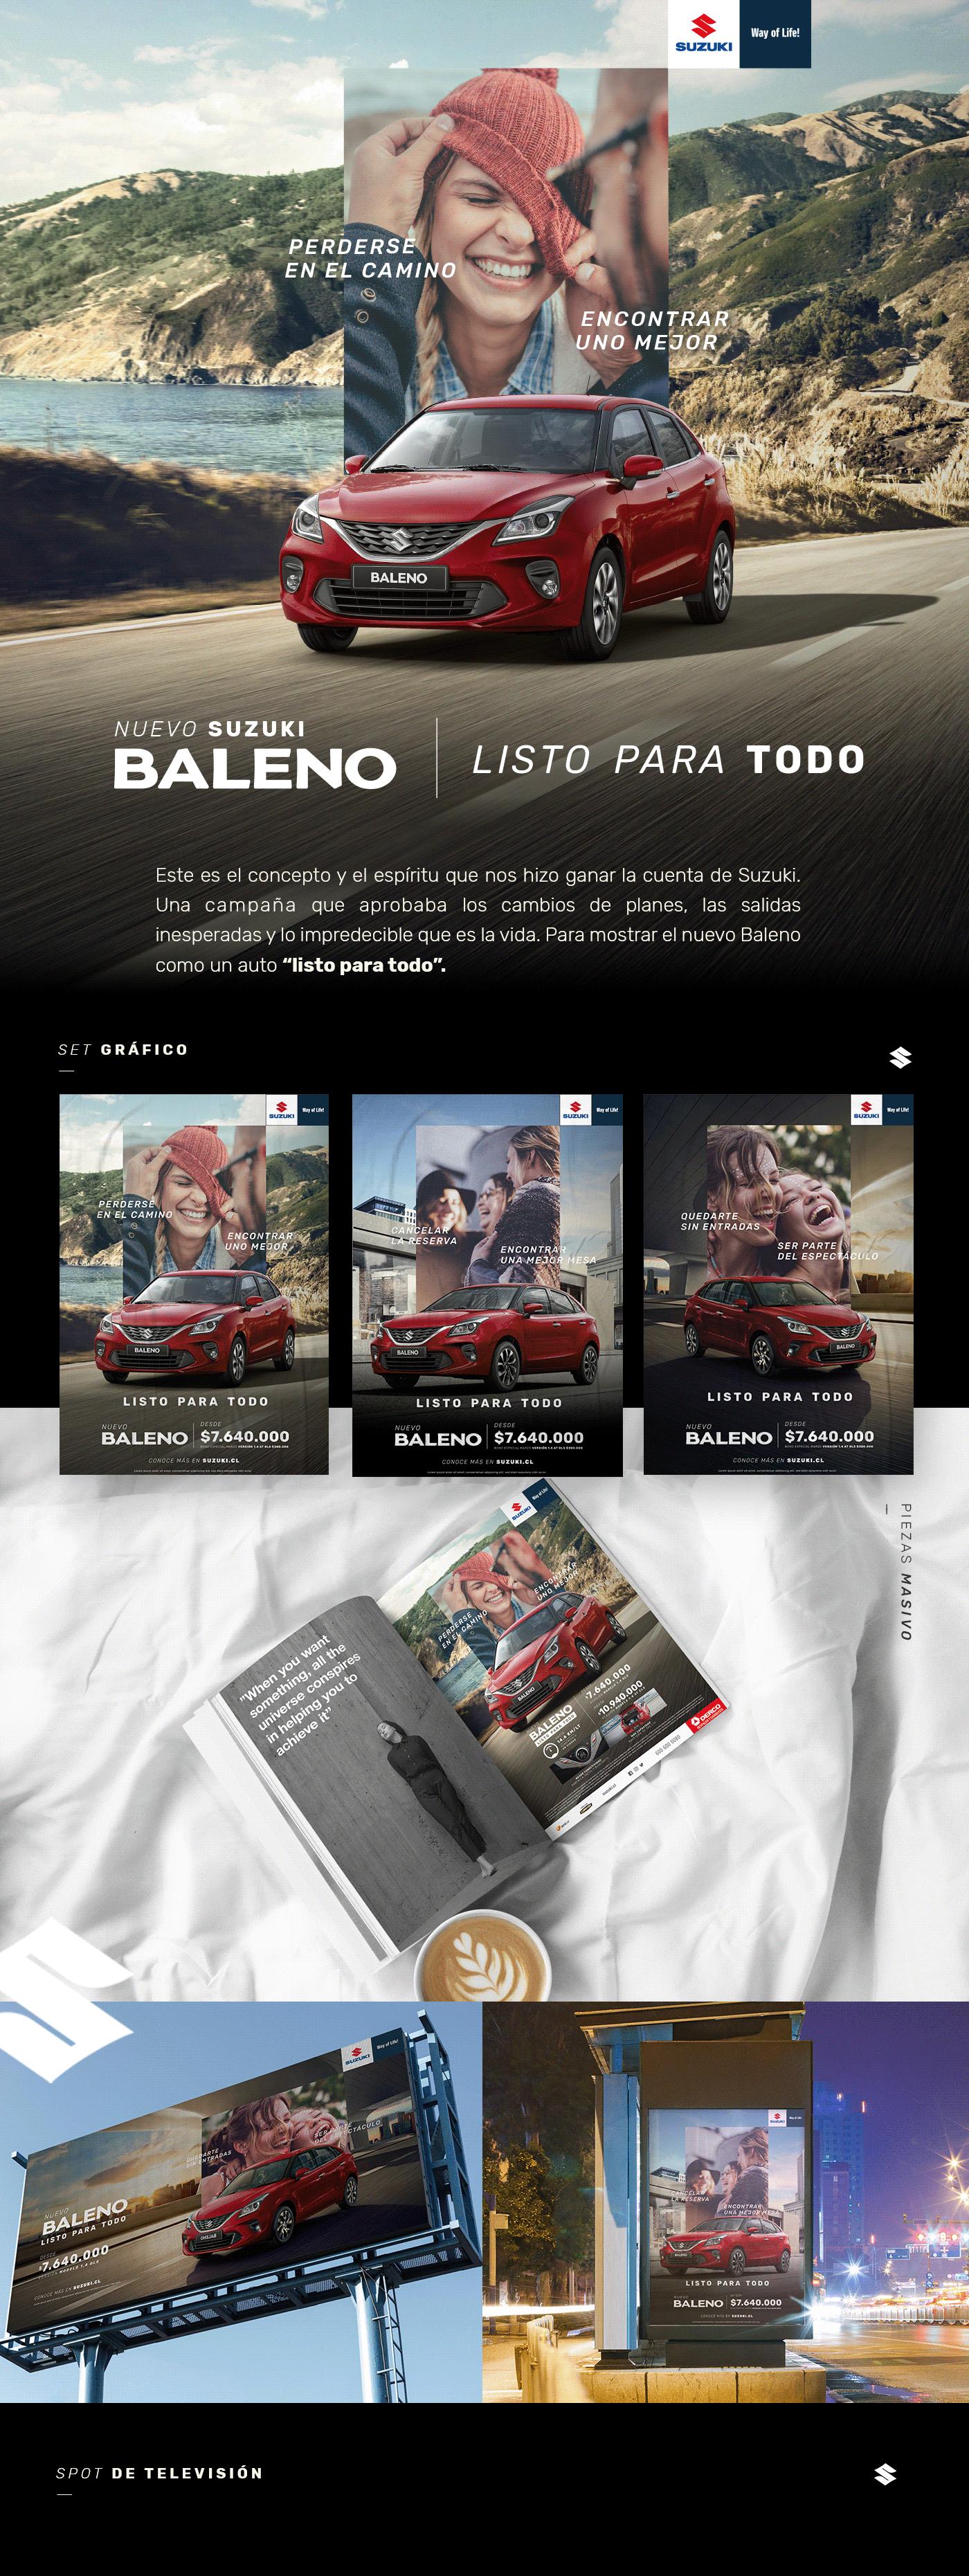 Advertising  ArtDirection Baleno Bidding Cars concept copywrite Suzuki suzukichile suzukimotor